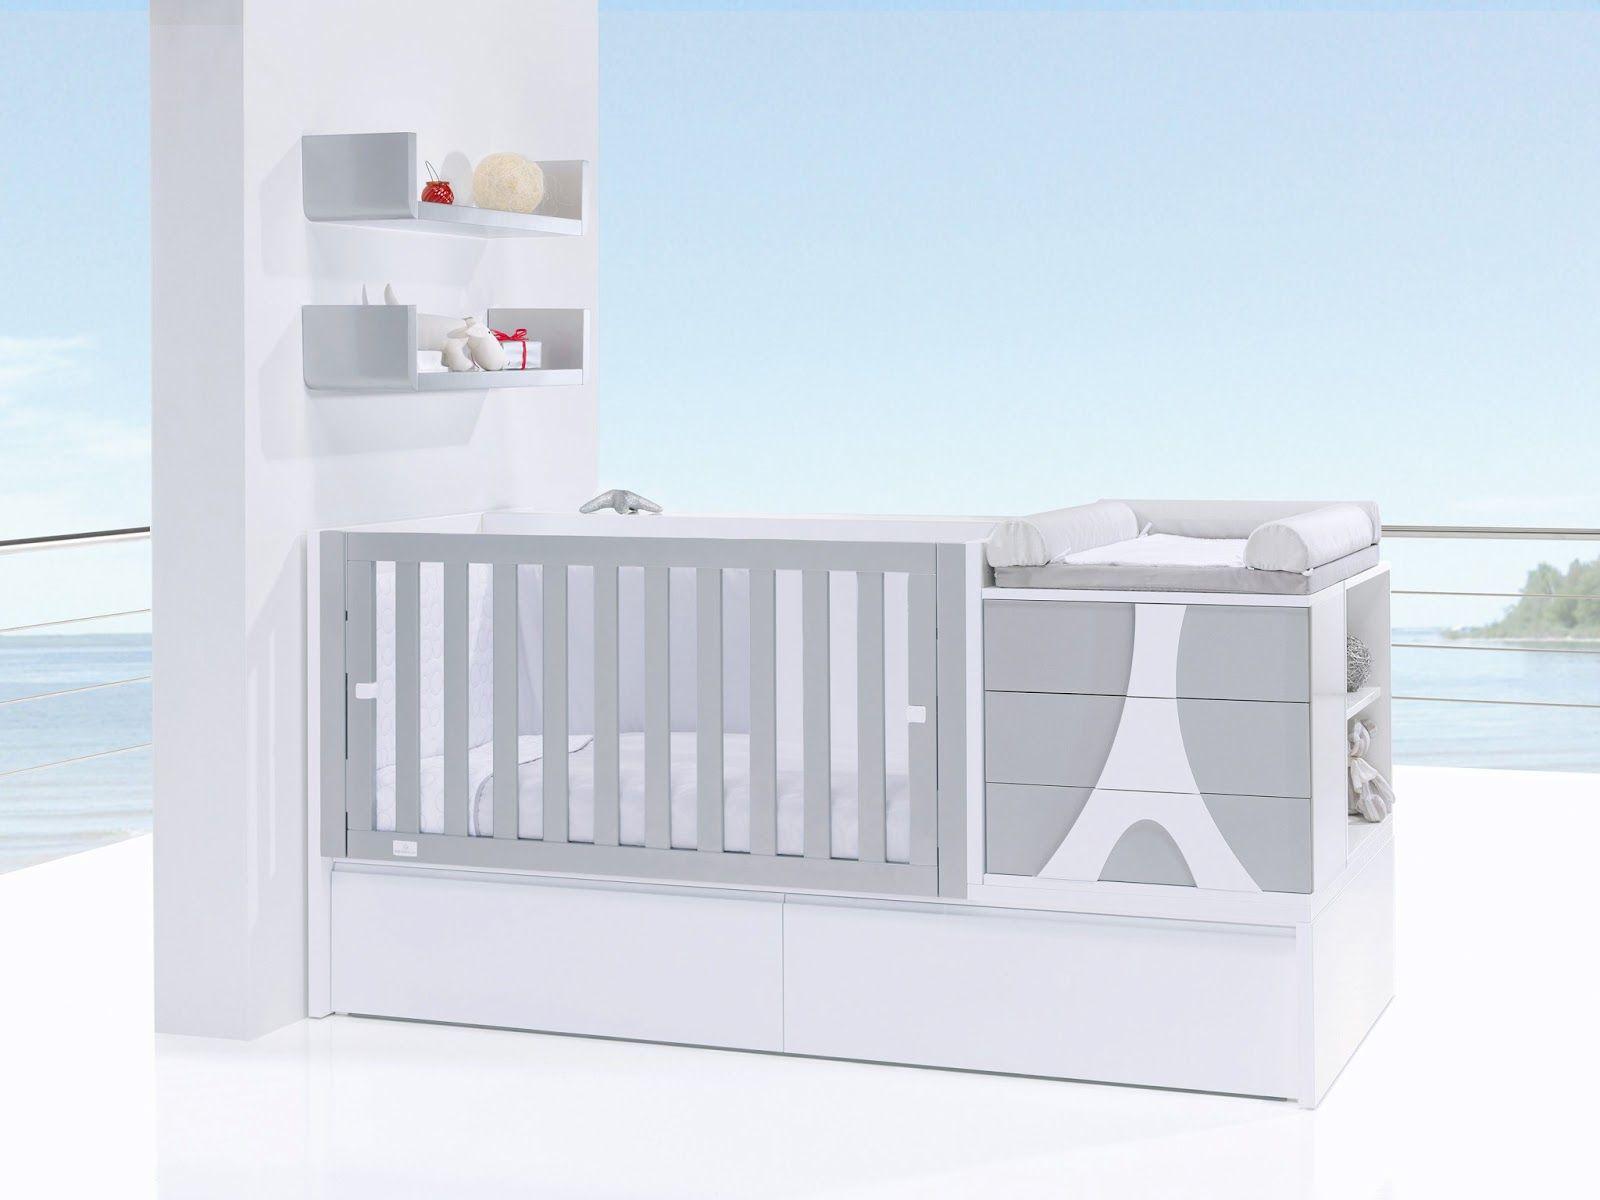 Pali Camerette ~ Justmoment set bimbo pali smart maison bebè lettino fasciatoio